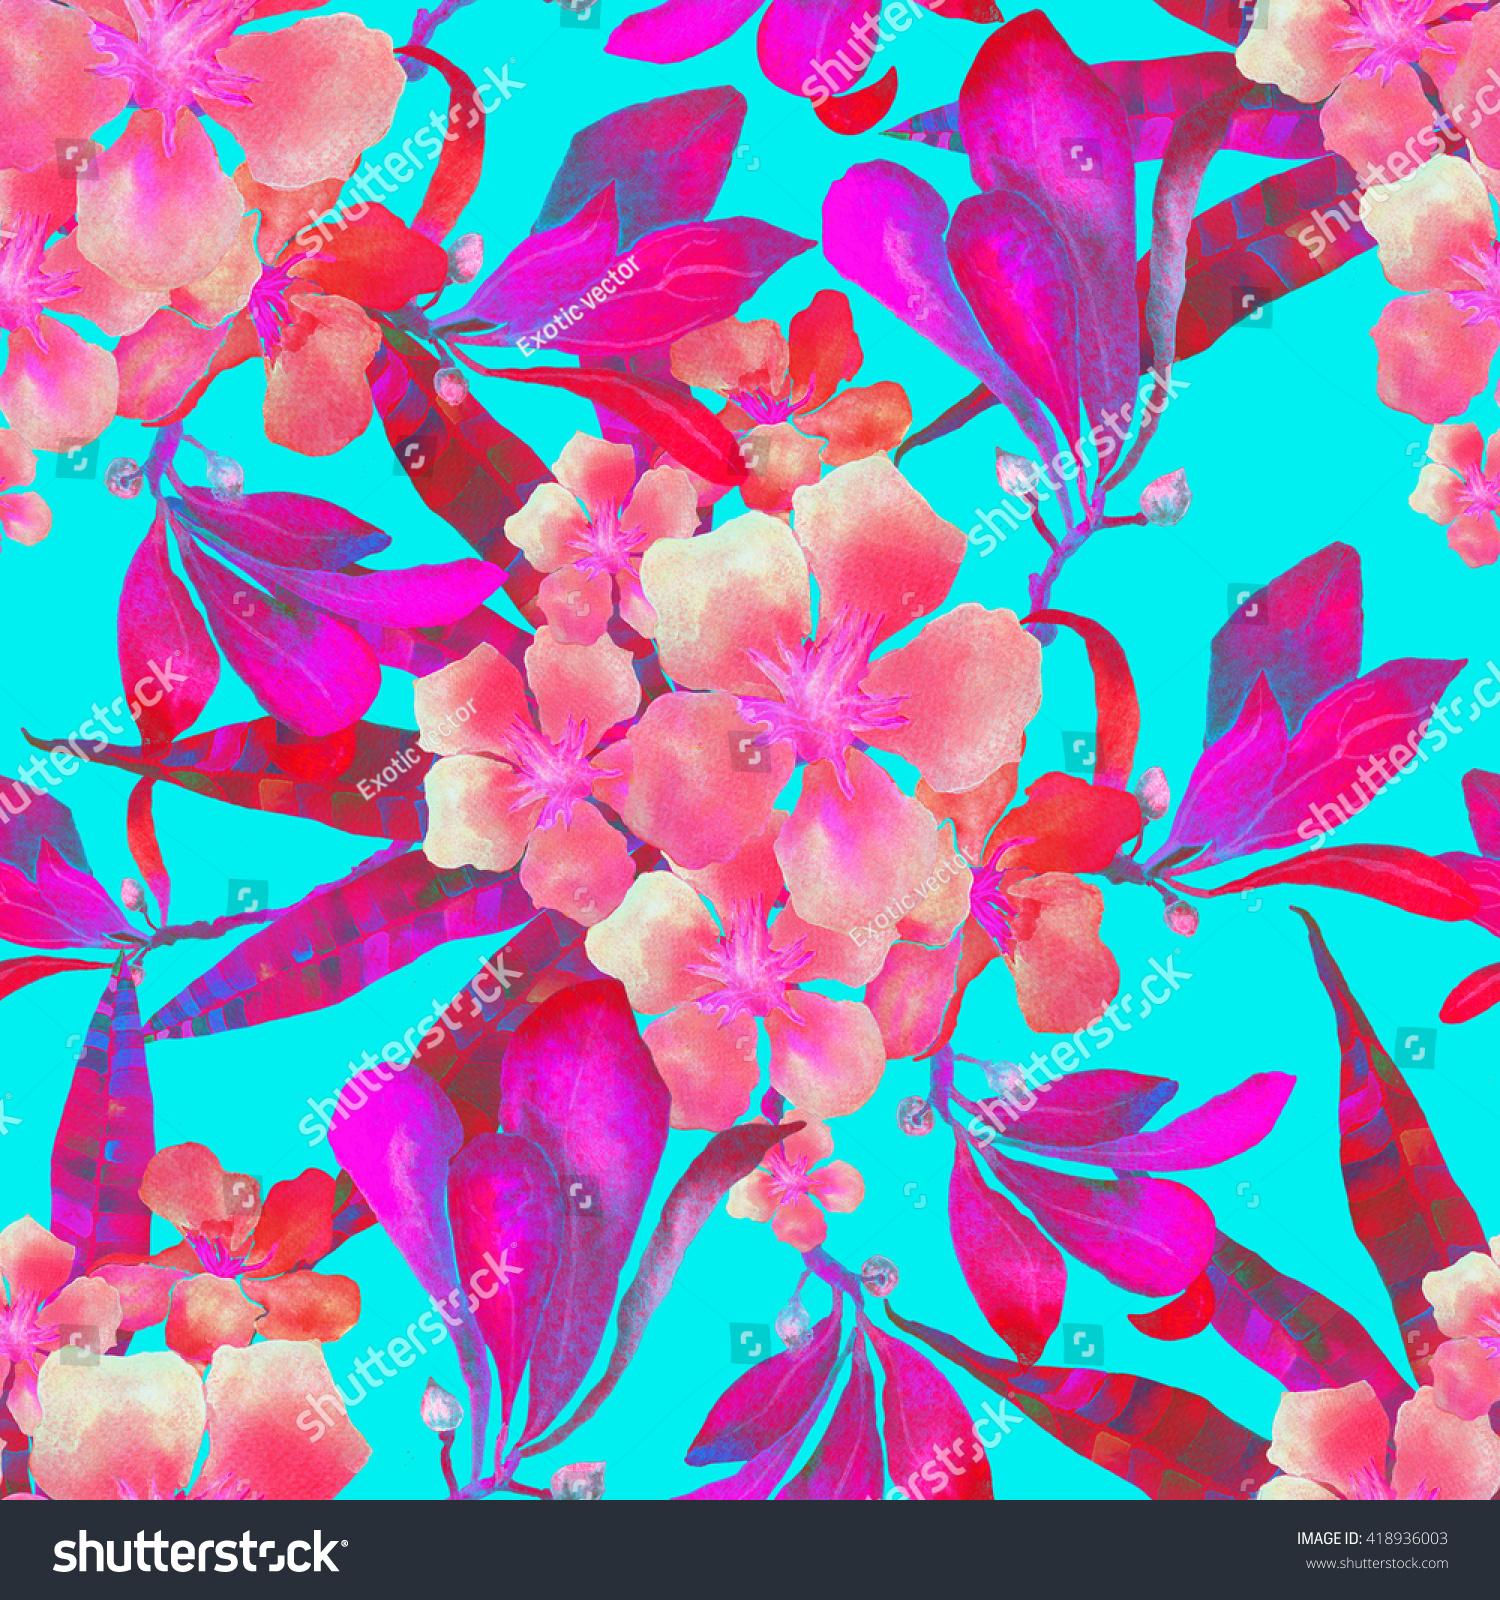 Tropical flowers pattern hawaiian tropical flowers stock tropical flowers pattern hawaiian tropical flowers pattern exotic background seamless pattern with watercolor izmirmasajfo